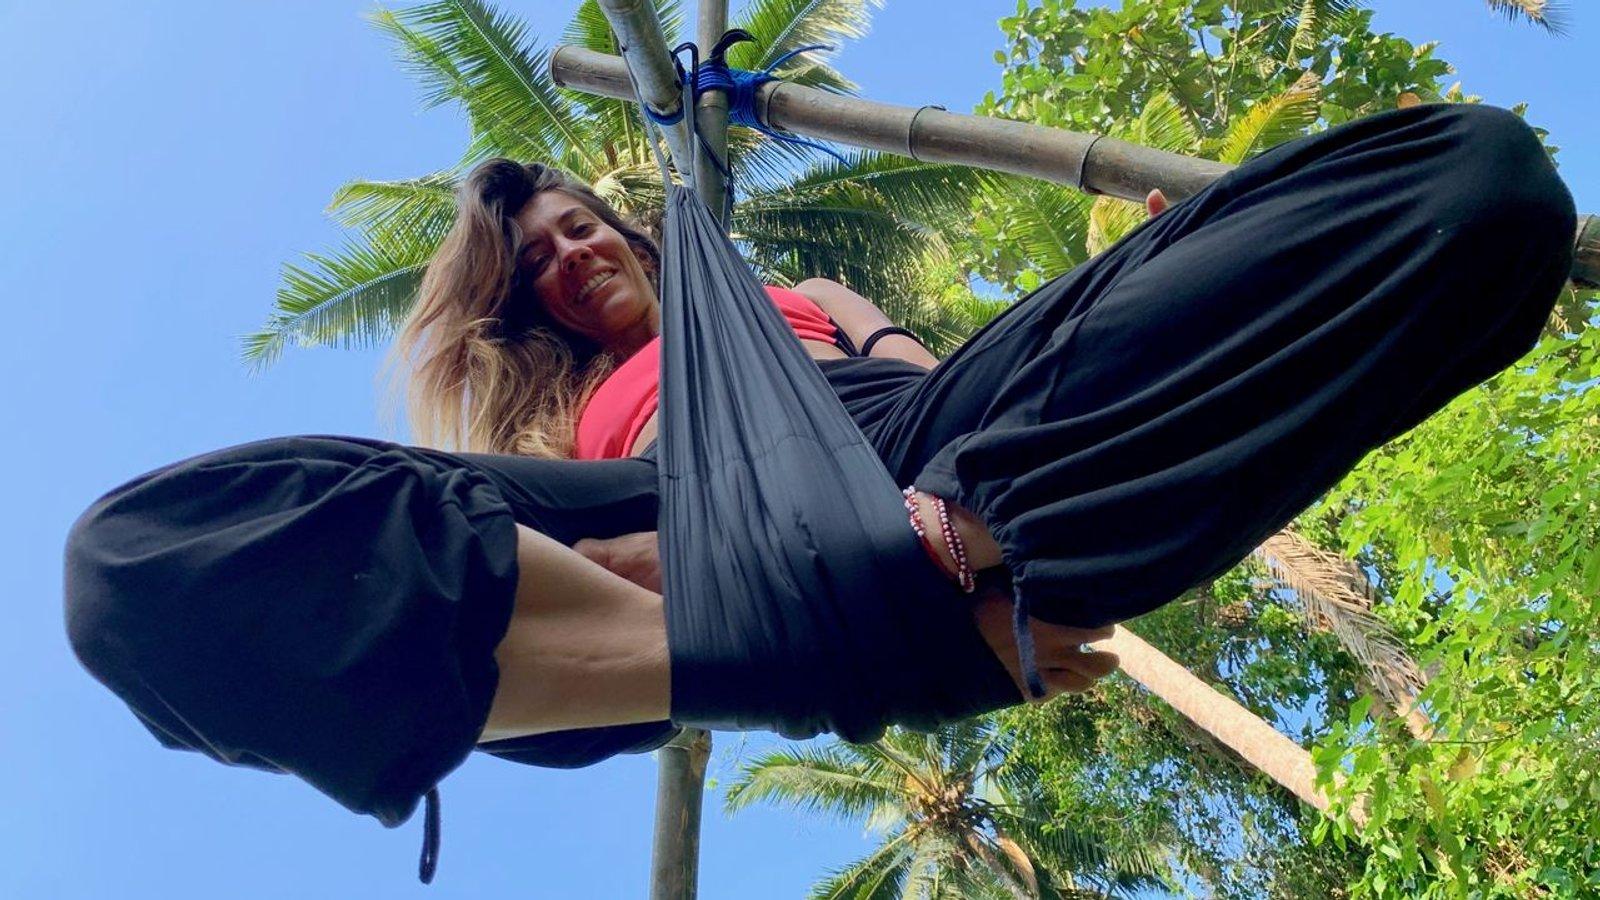 Ulu Yoga Reviews Profile Contact Bookyogateachertraining Com